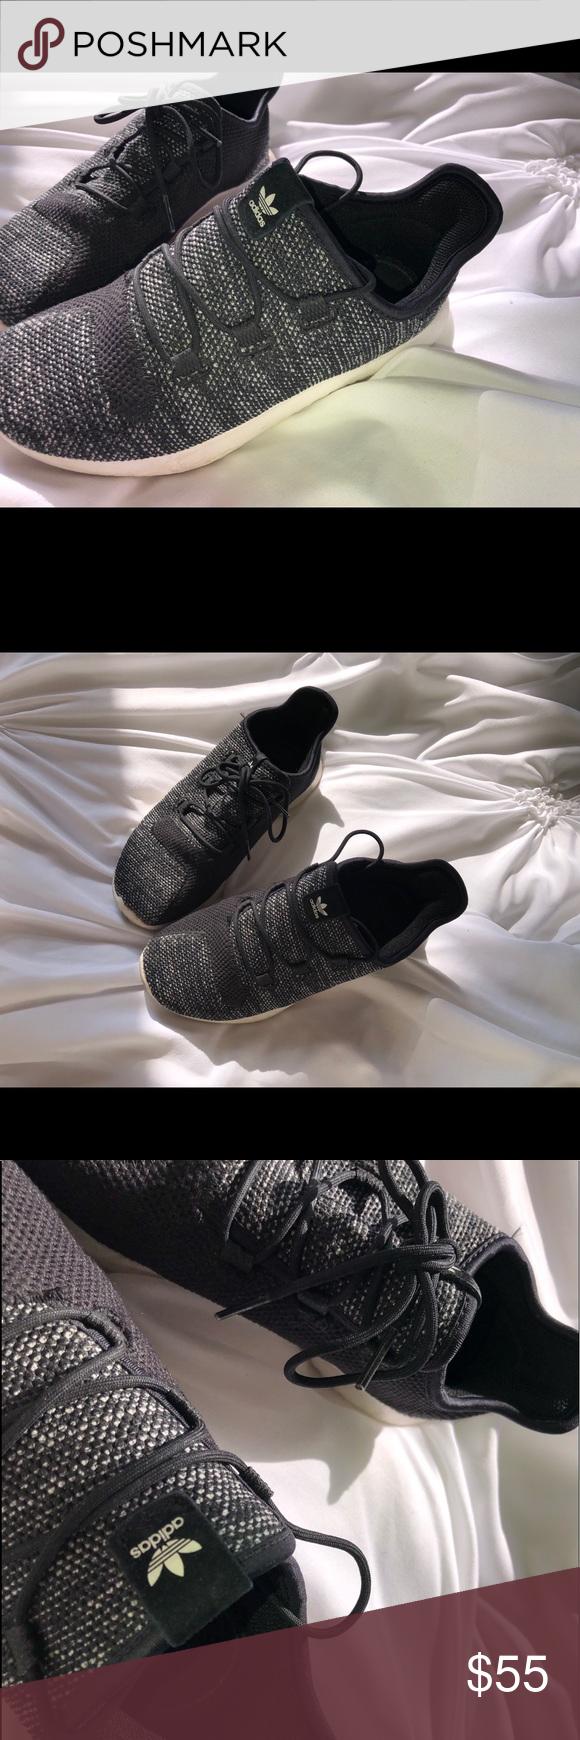 Adidas Tubulare Ombra Grigio / Nero Pinterest Adidas